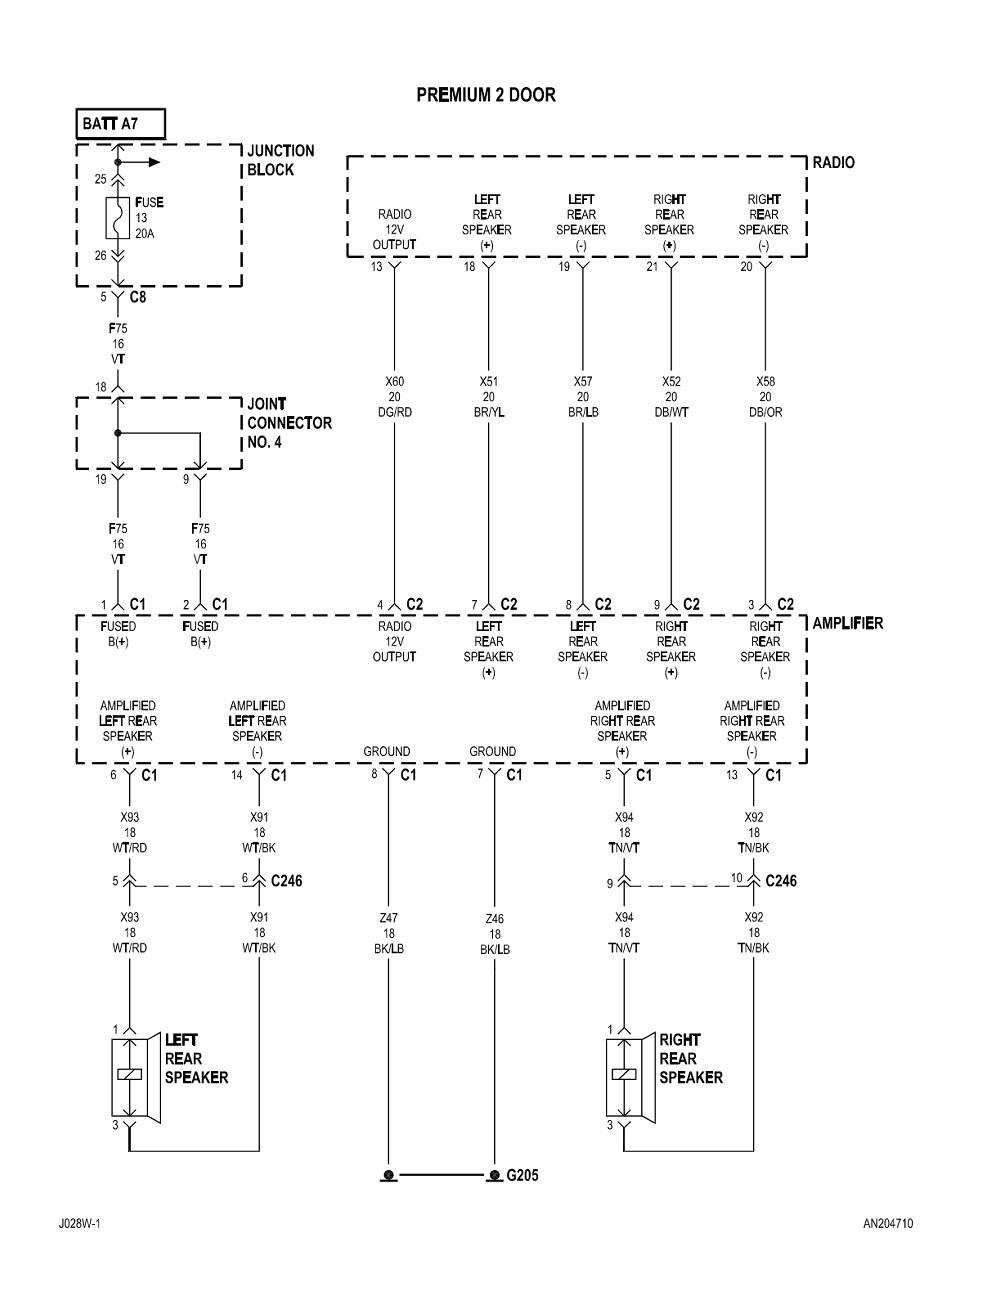 hight resolution of 1997 dodge dakota radio wiring diagram download wiring diagram sample rh faceitsalon com 2002 dodge durango